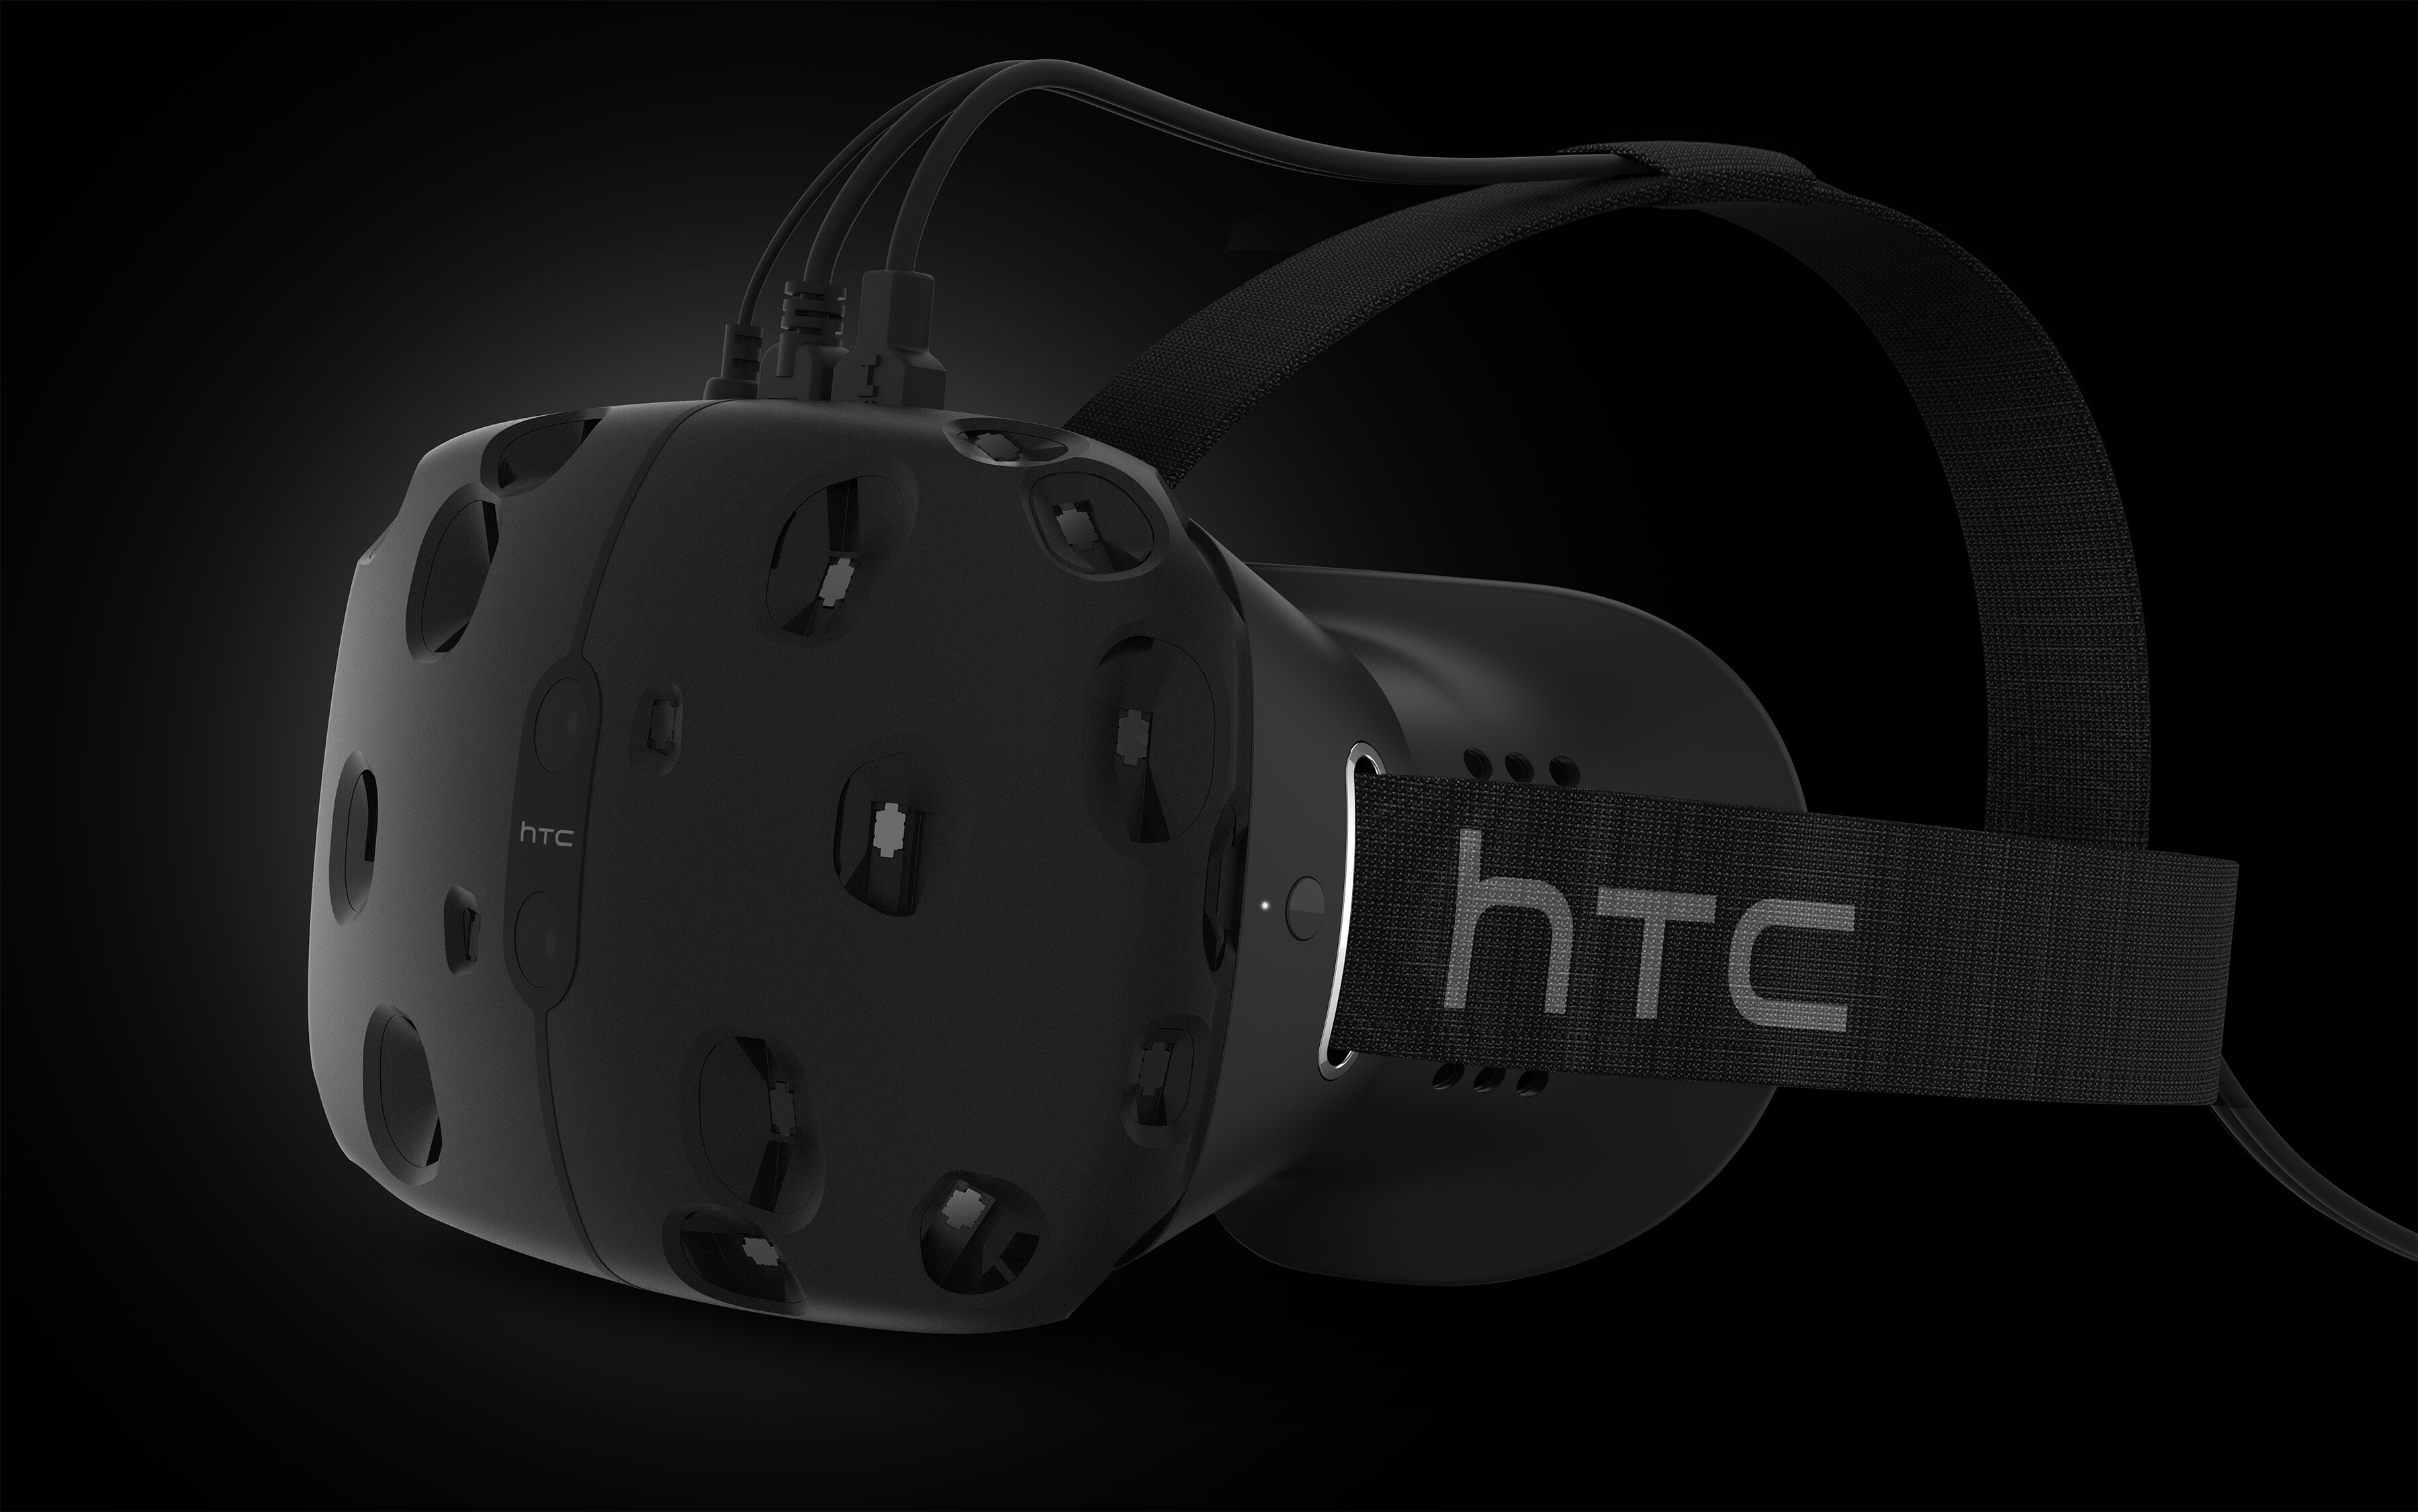 http://i-cdn.phonearena.com/images/articles/170437-image/HTC-Vive.jpg